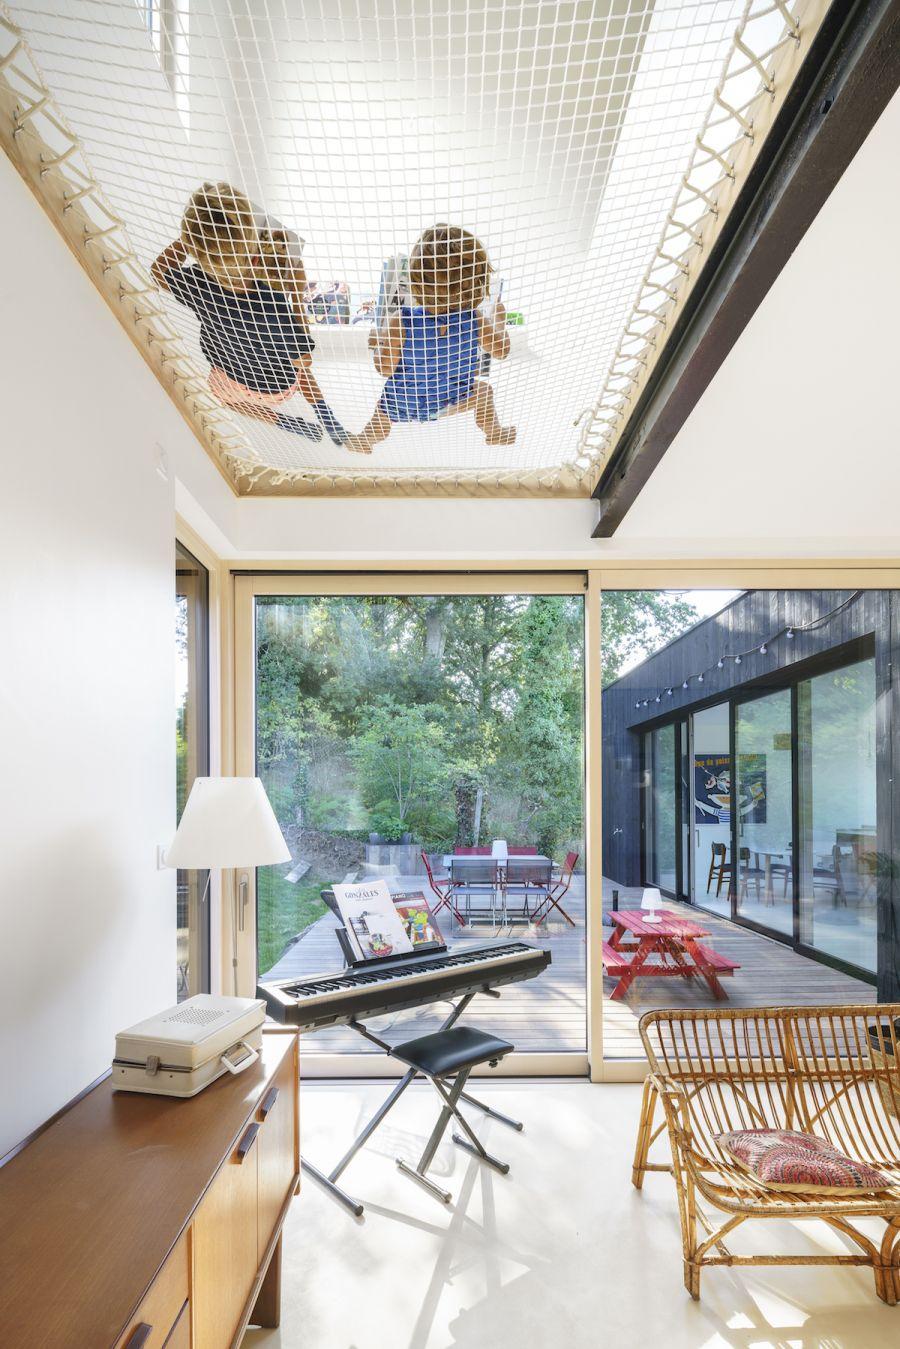 Maison An-unan à Auray - Arch. MSR Architecture - Photos : Frédéric Baron, 1,618 Photos